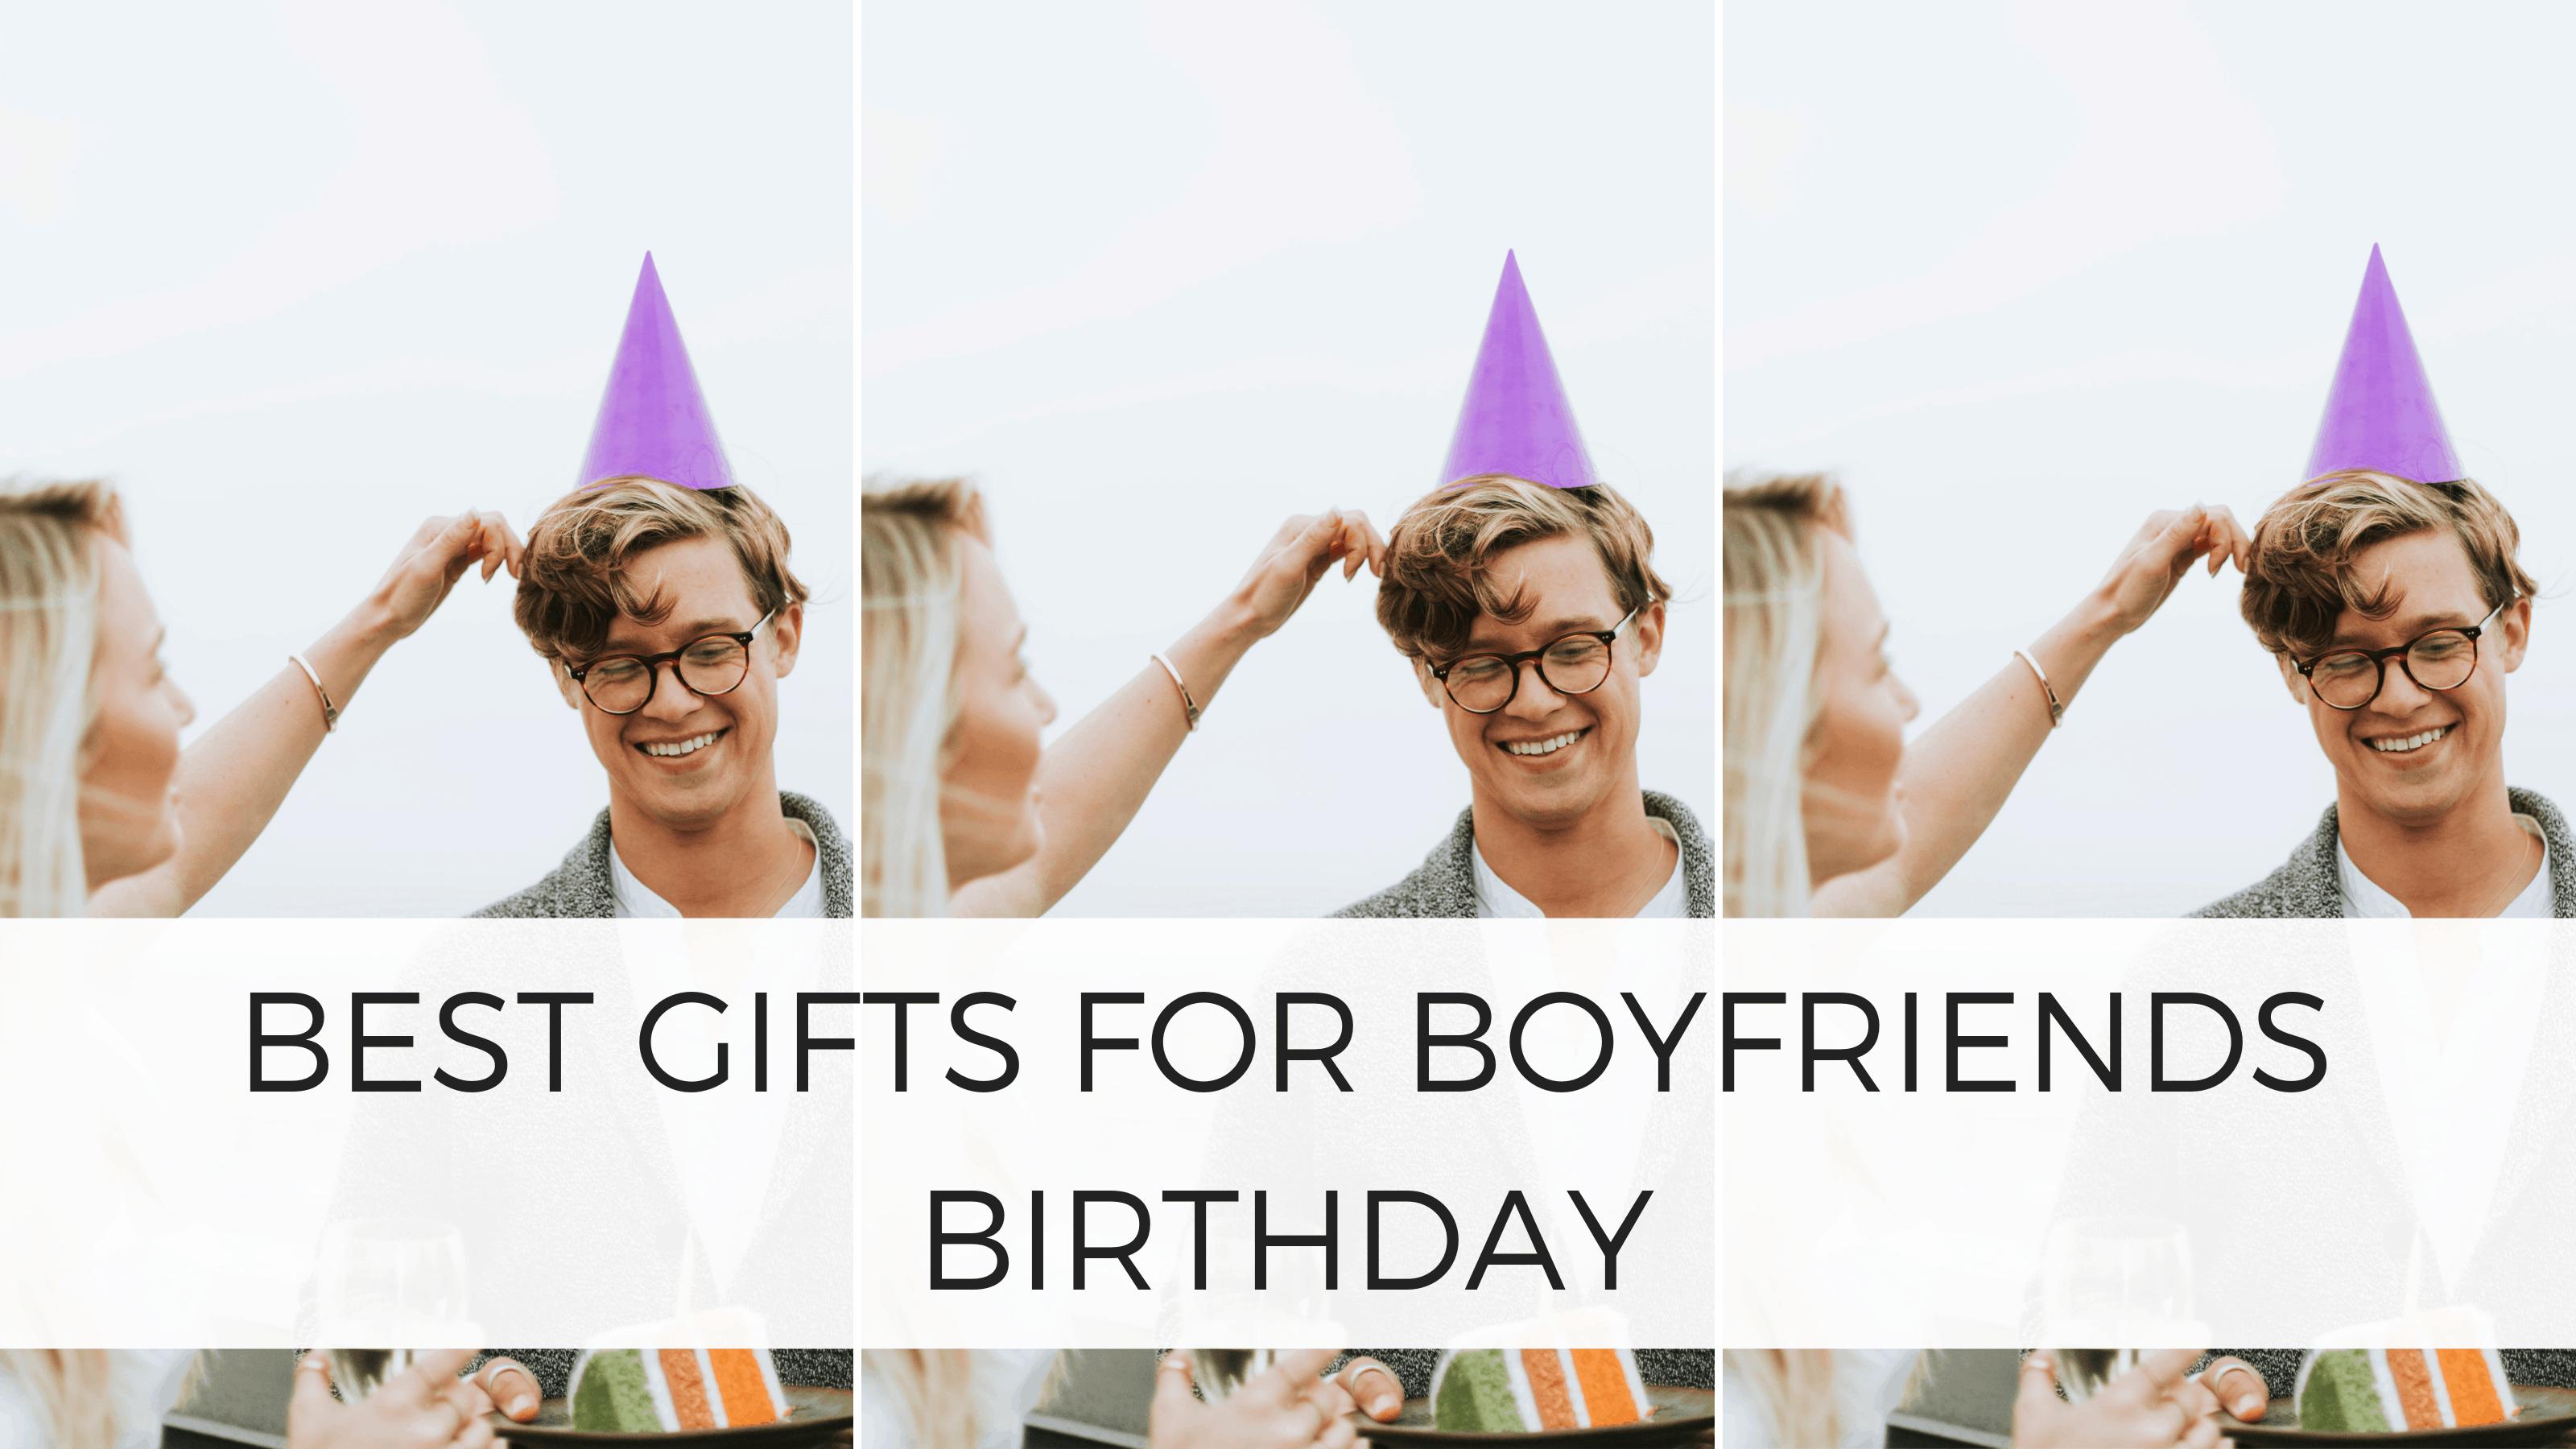 gifts for boyfriends birthday